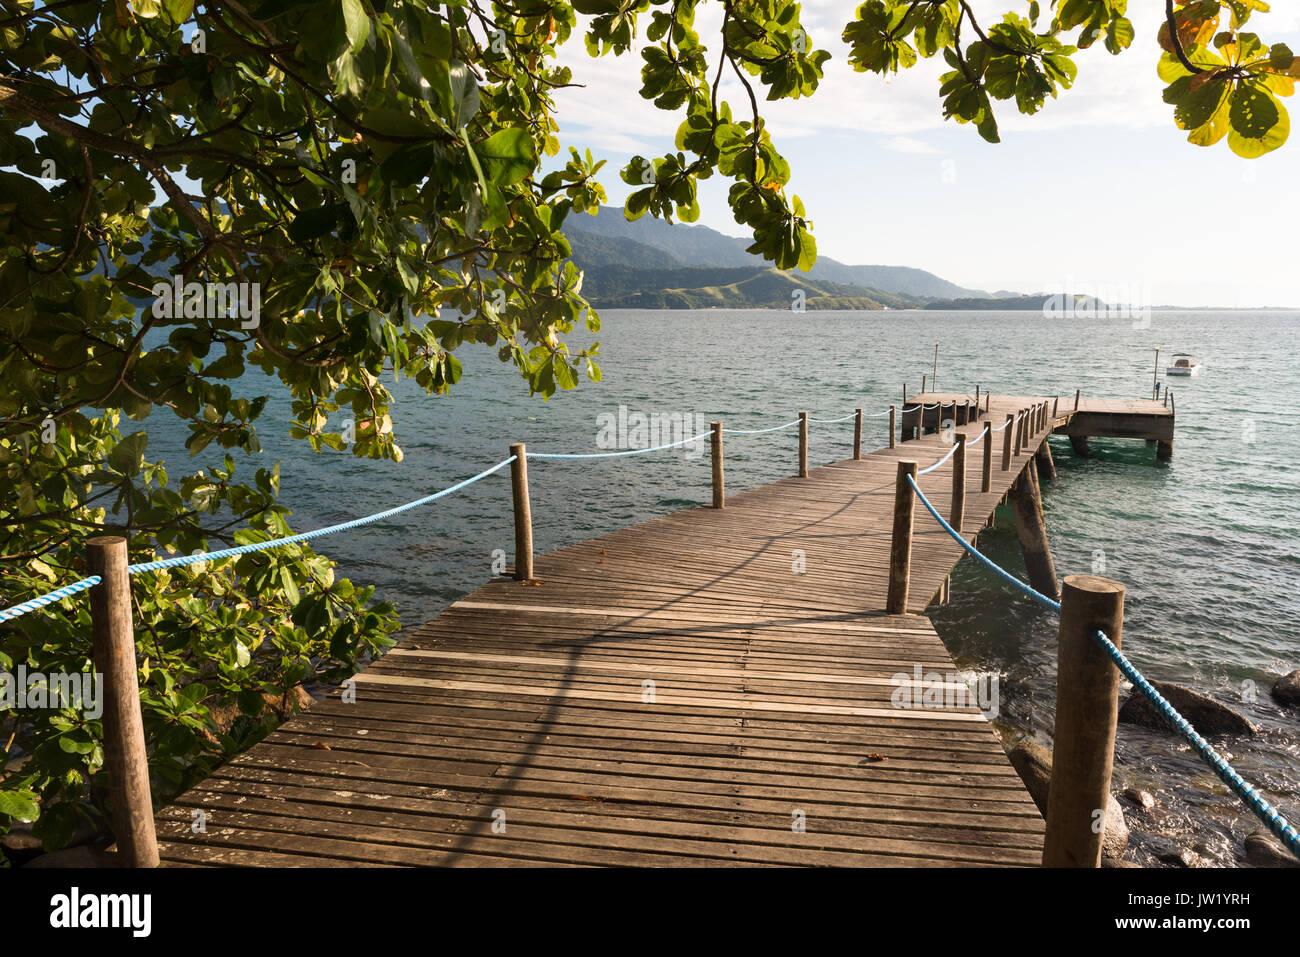 A wooden pier in Ilhabela, Brazil - Stock Image